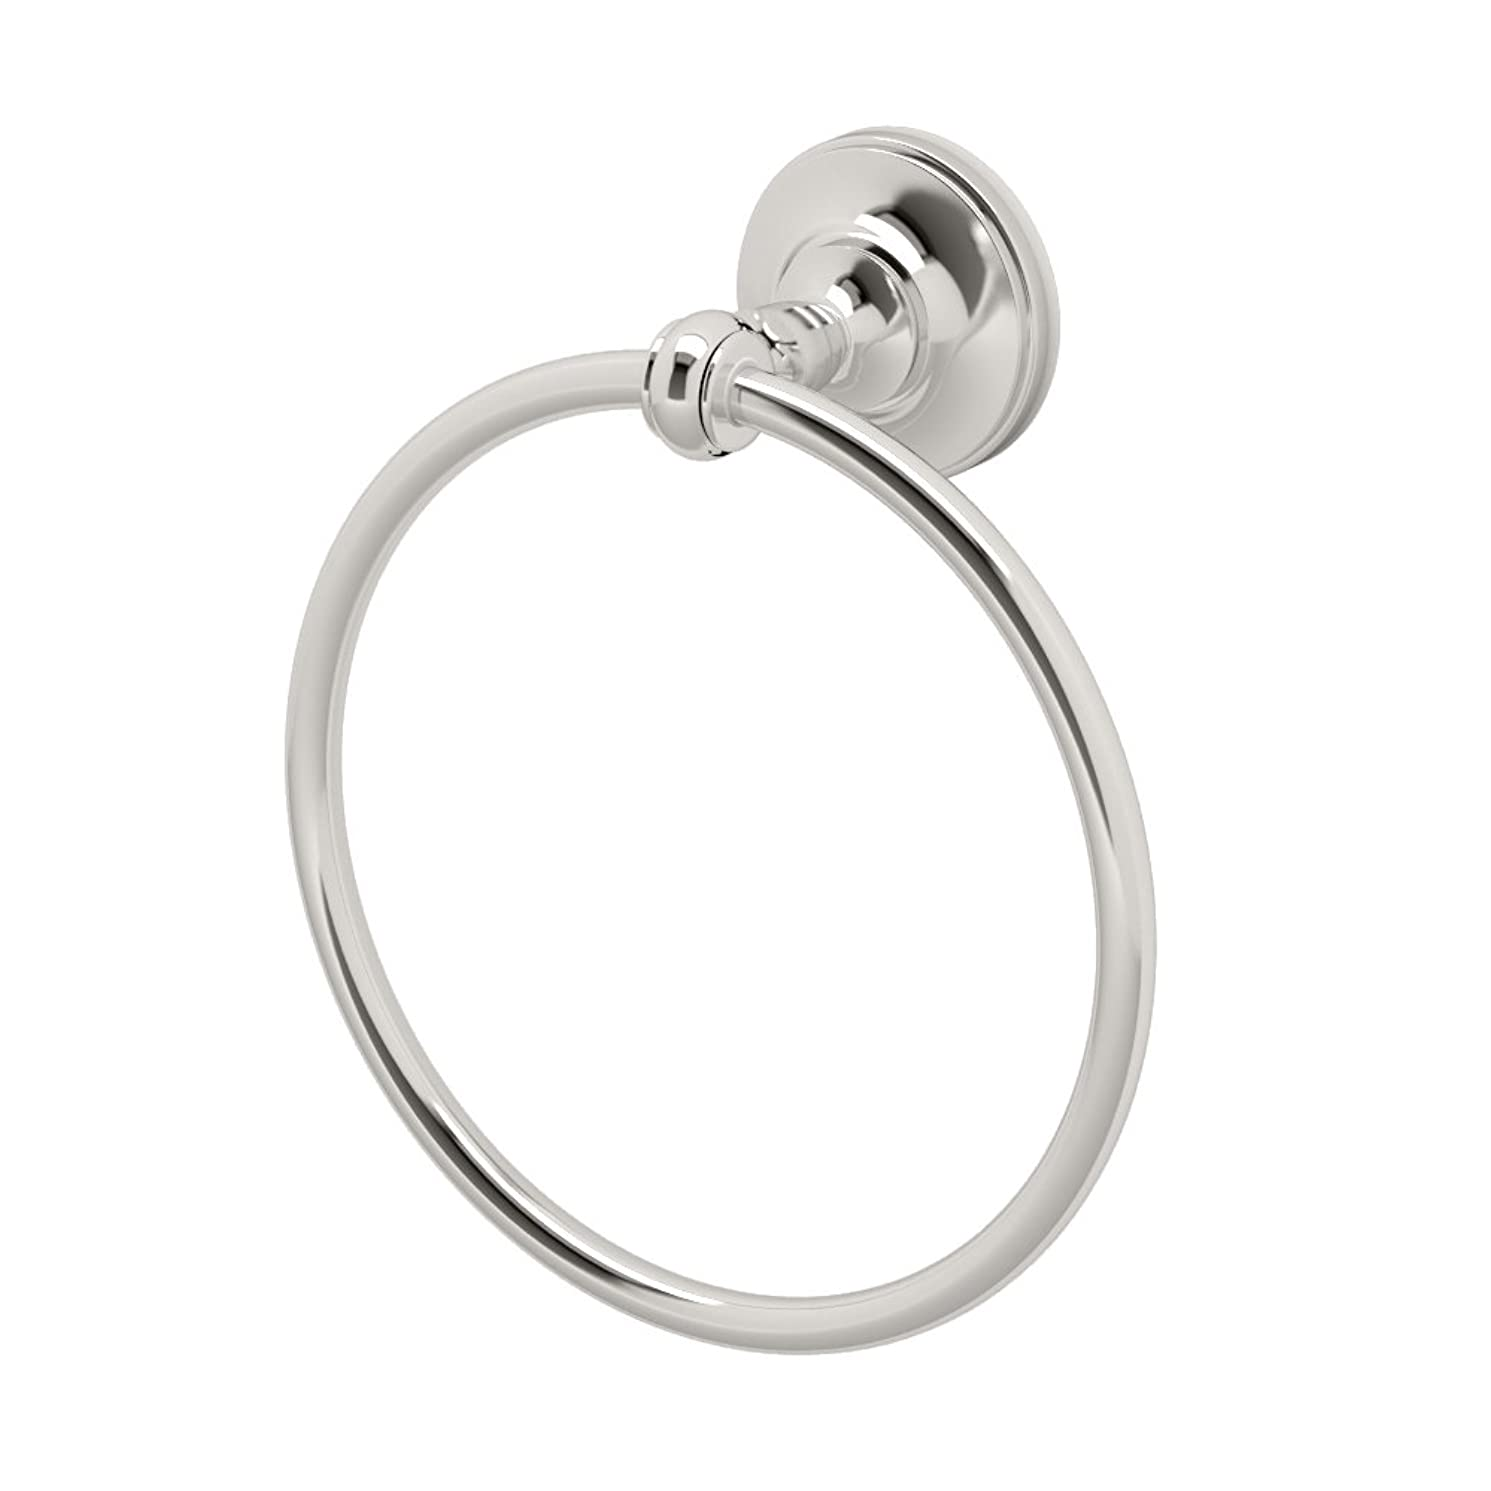 Gatco 4122 Tavern Towel Ring, Polished Nickel